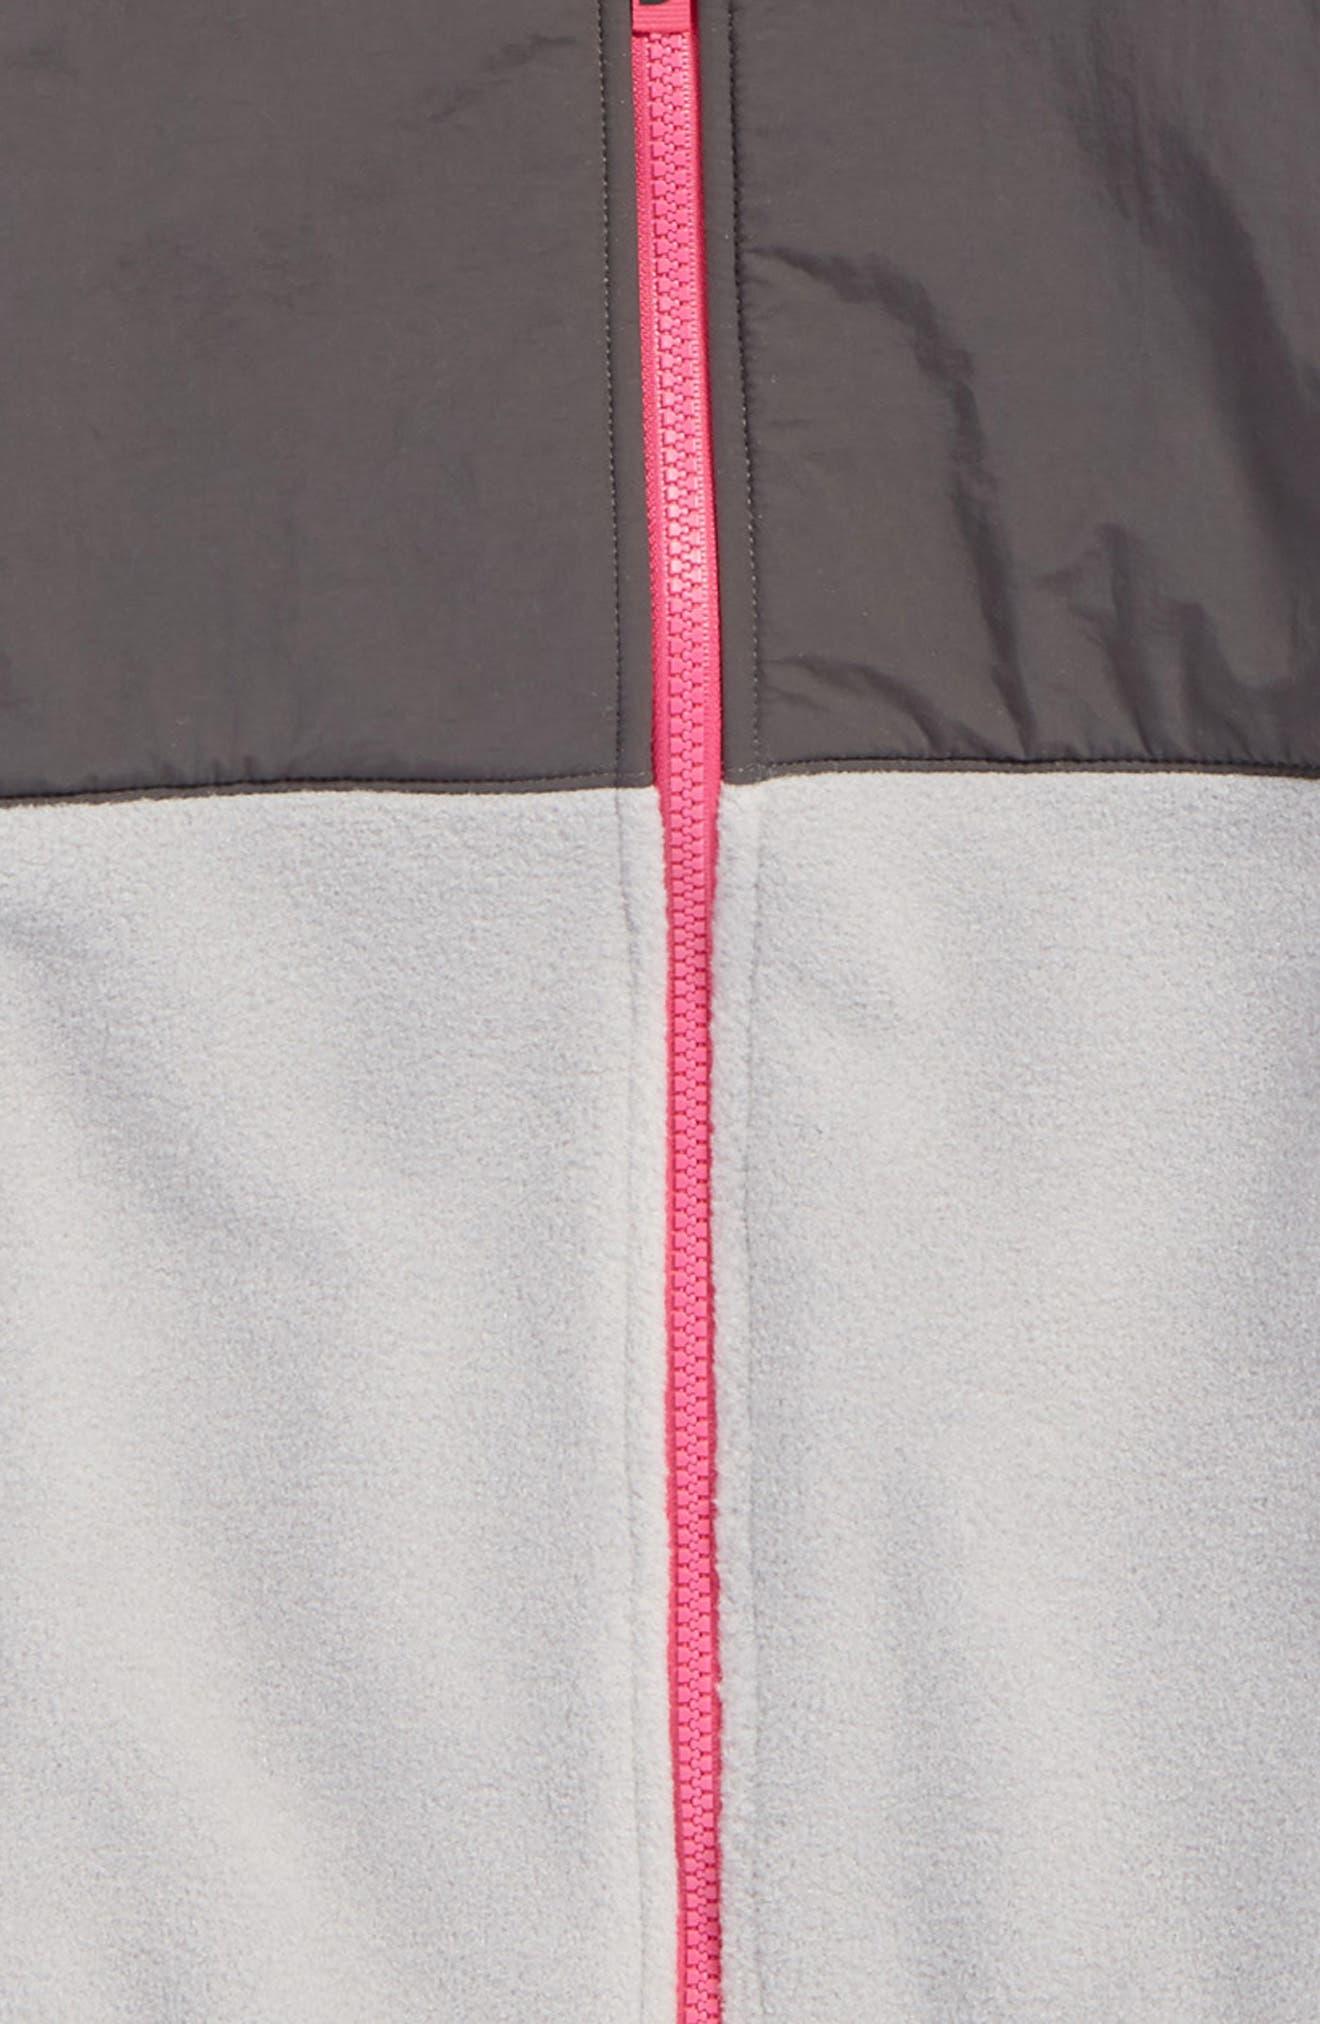 Denali Recycled Fleece Jacket,                             Alternate thumbnail 2, color,                             021